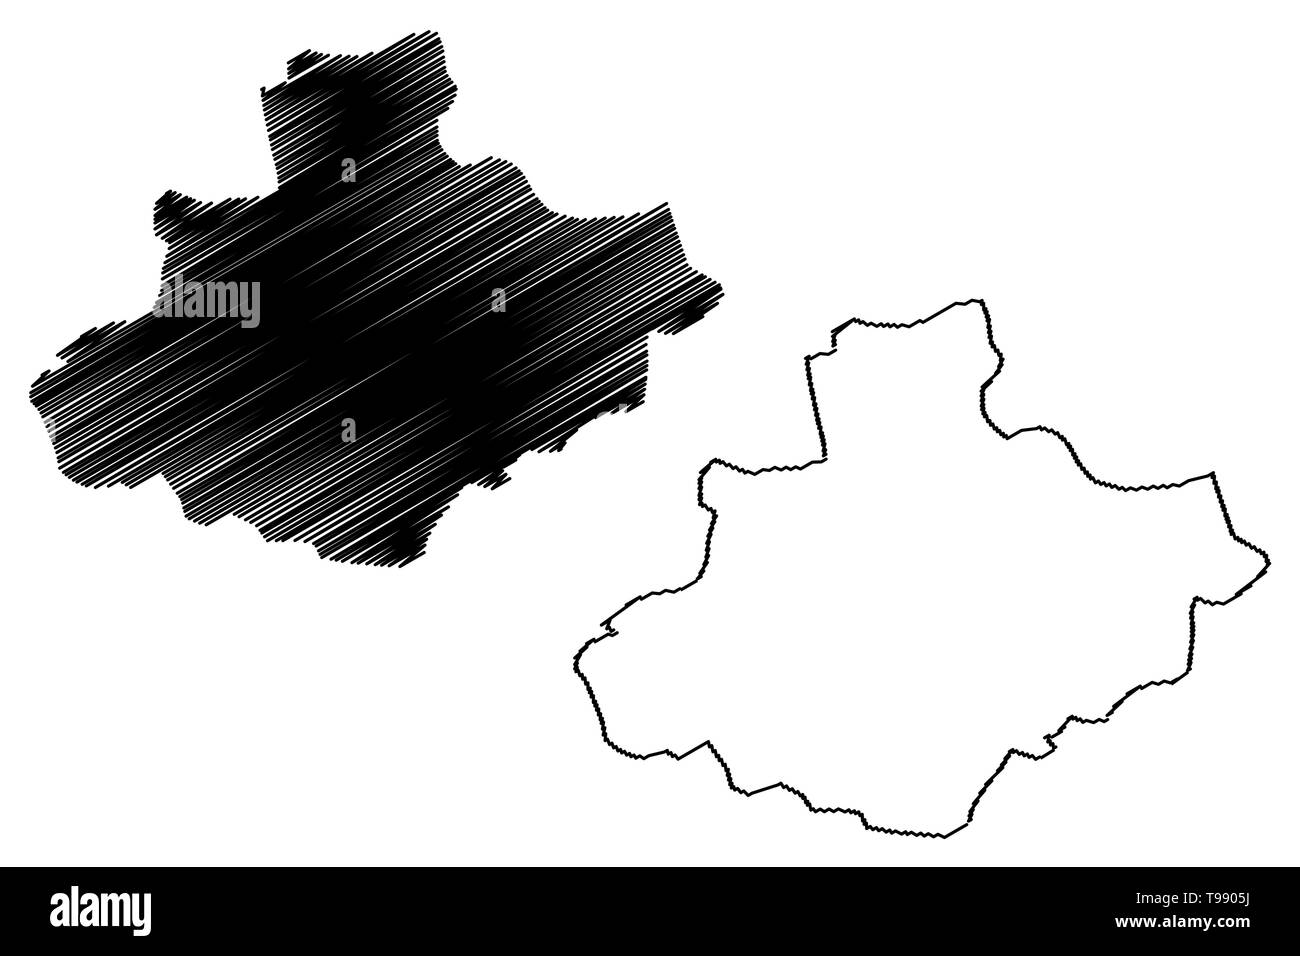 Relizane Province (Provinces of Algeria, Peoples Democratic Republic of Algeria) map vector illustration, scribble sketch Relizane map - Stock Image